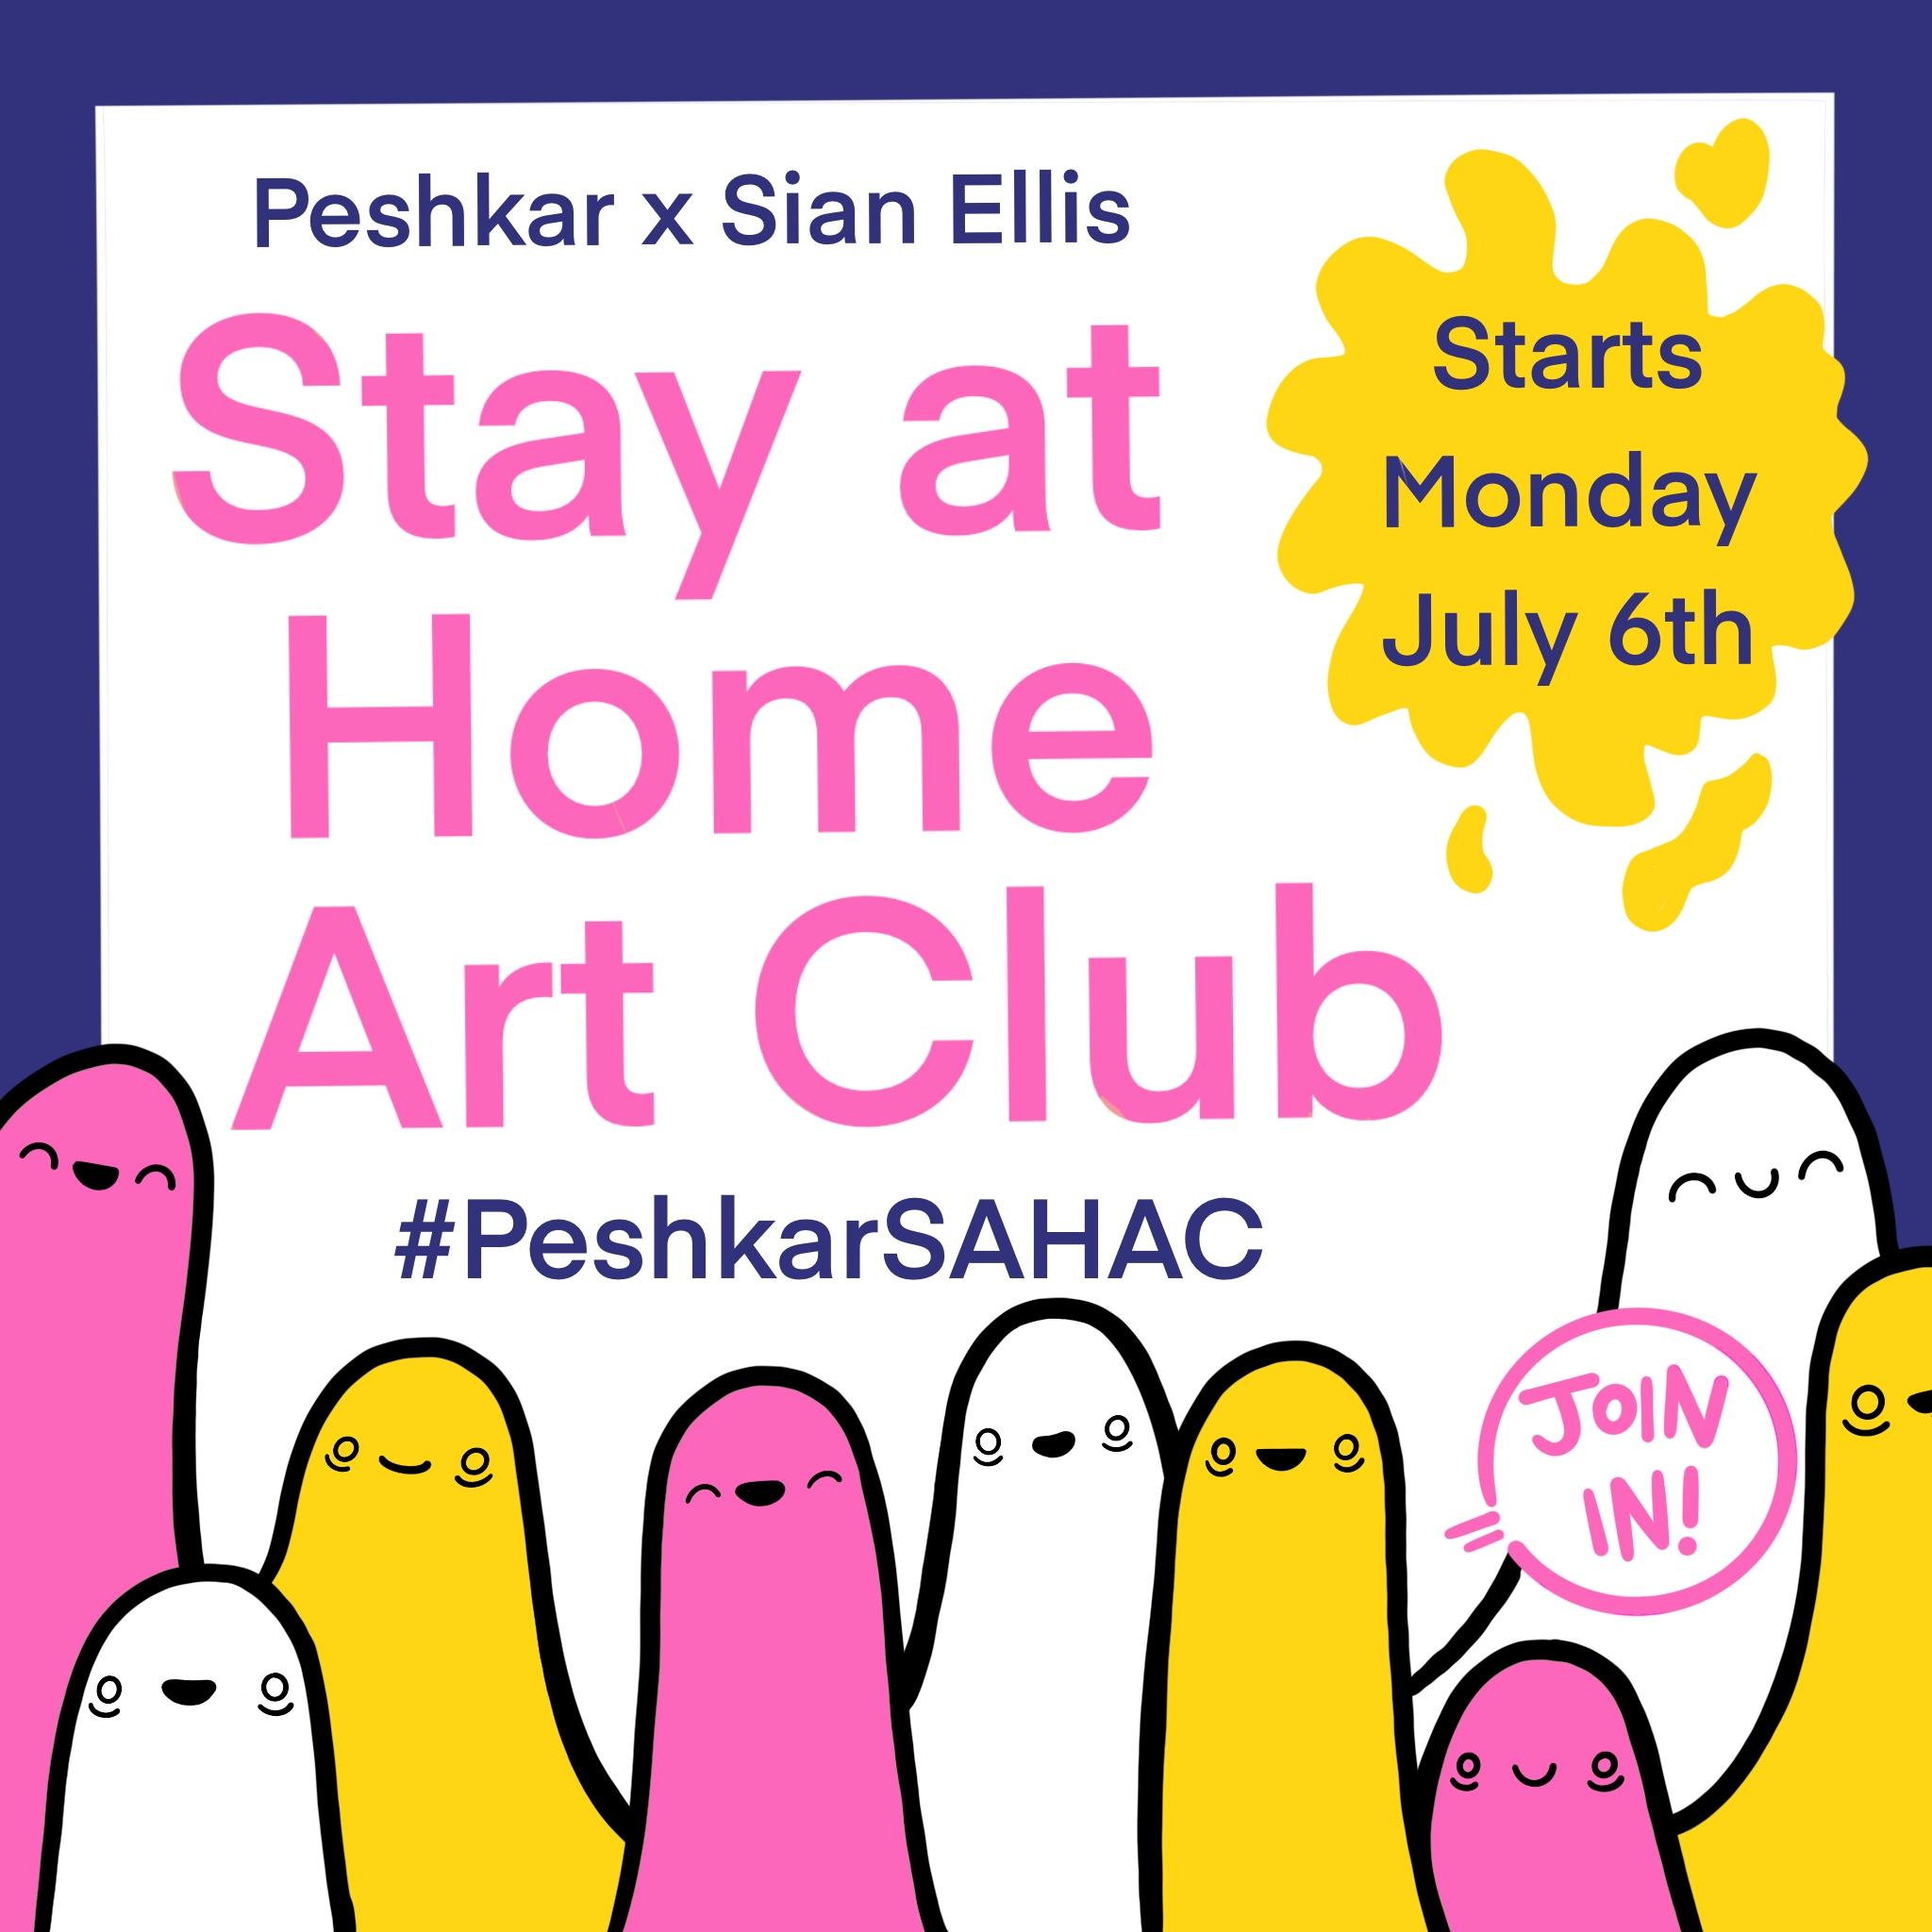 Peshkar Stay at Home Art Club